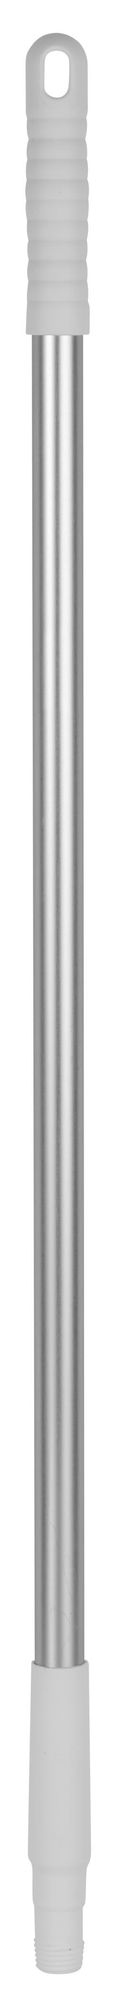 Vikan hygiëne steel 84cm wit -   29315